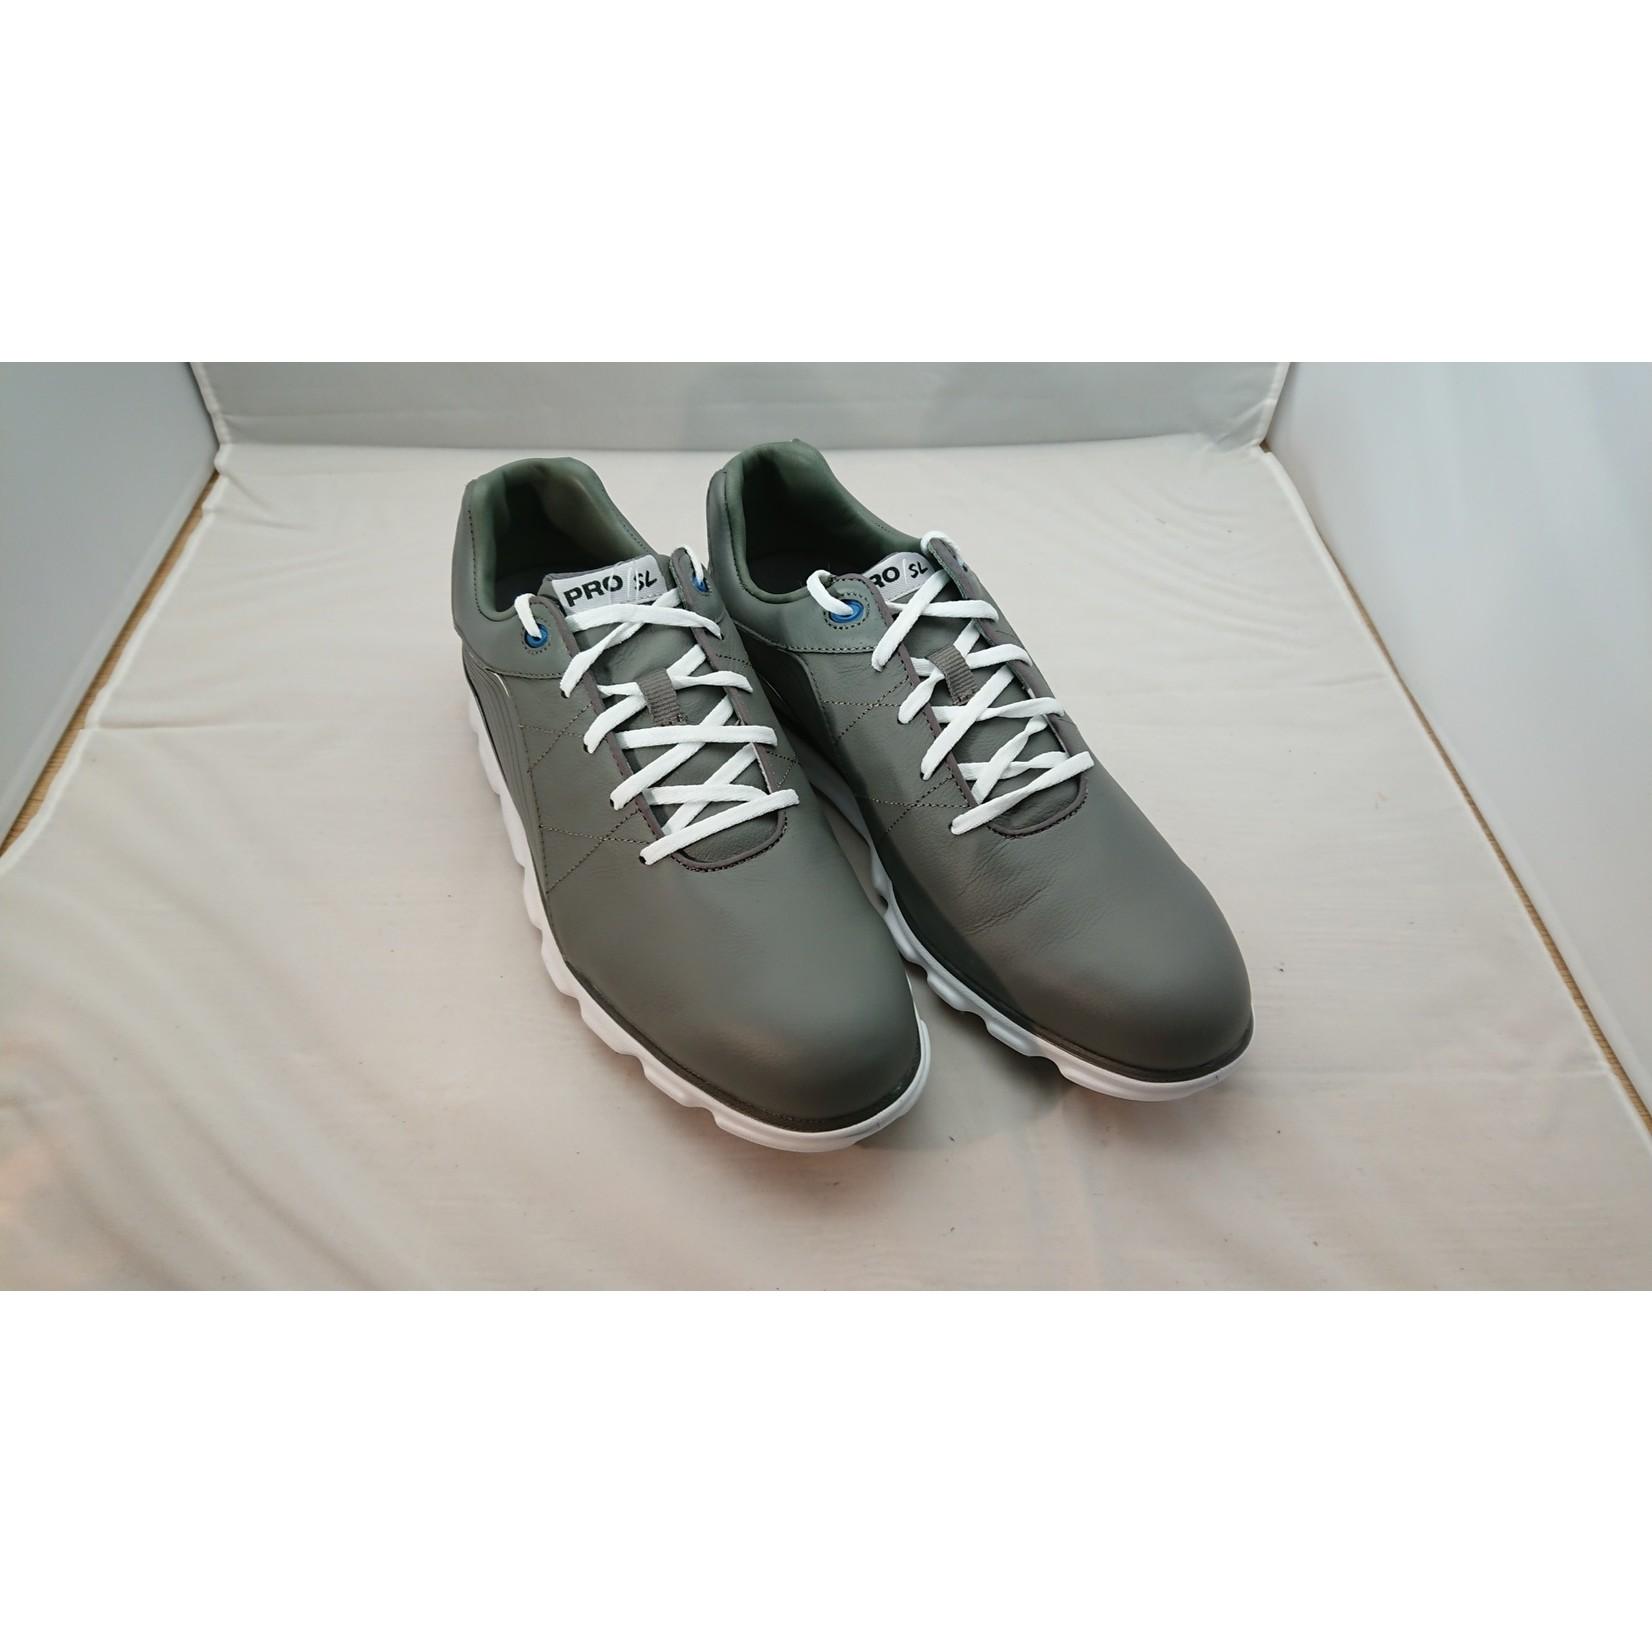 Footjoy Footjoy Pro SL